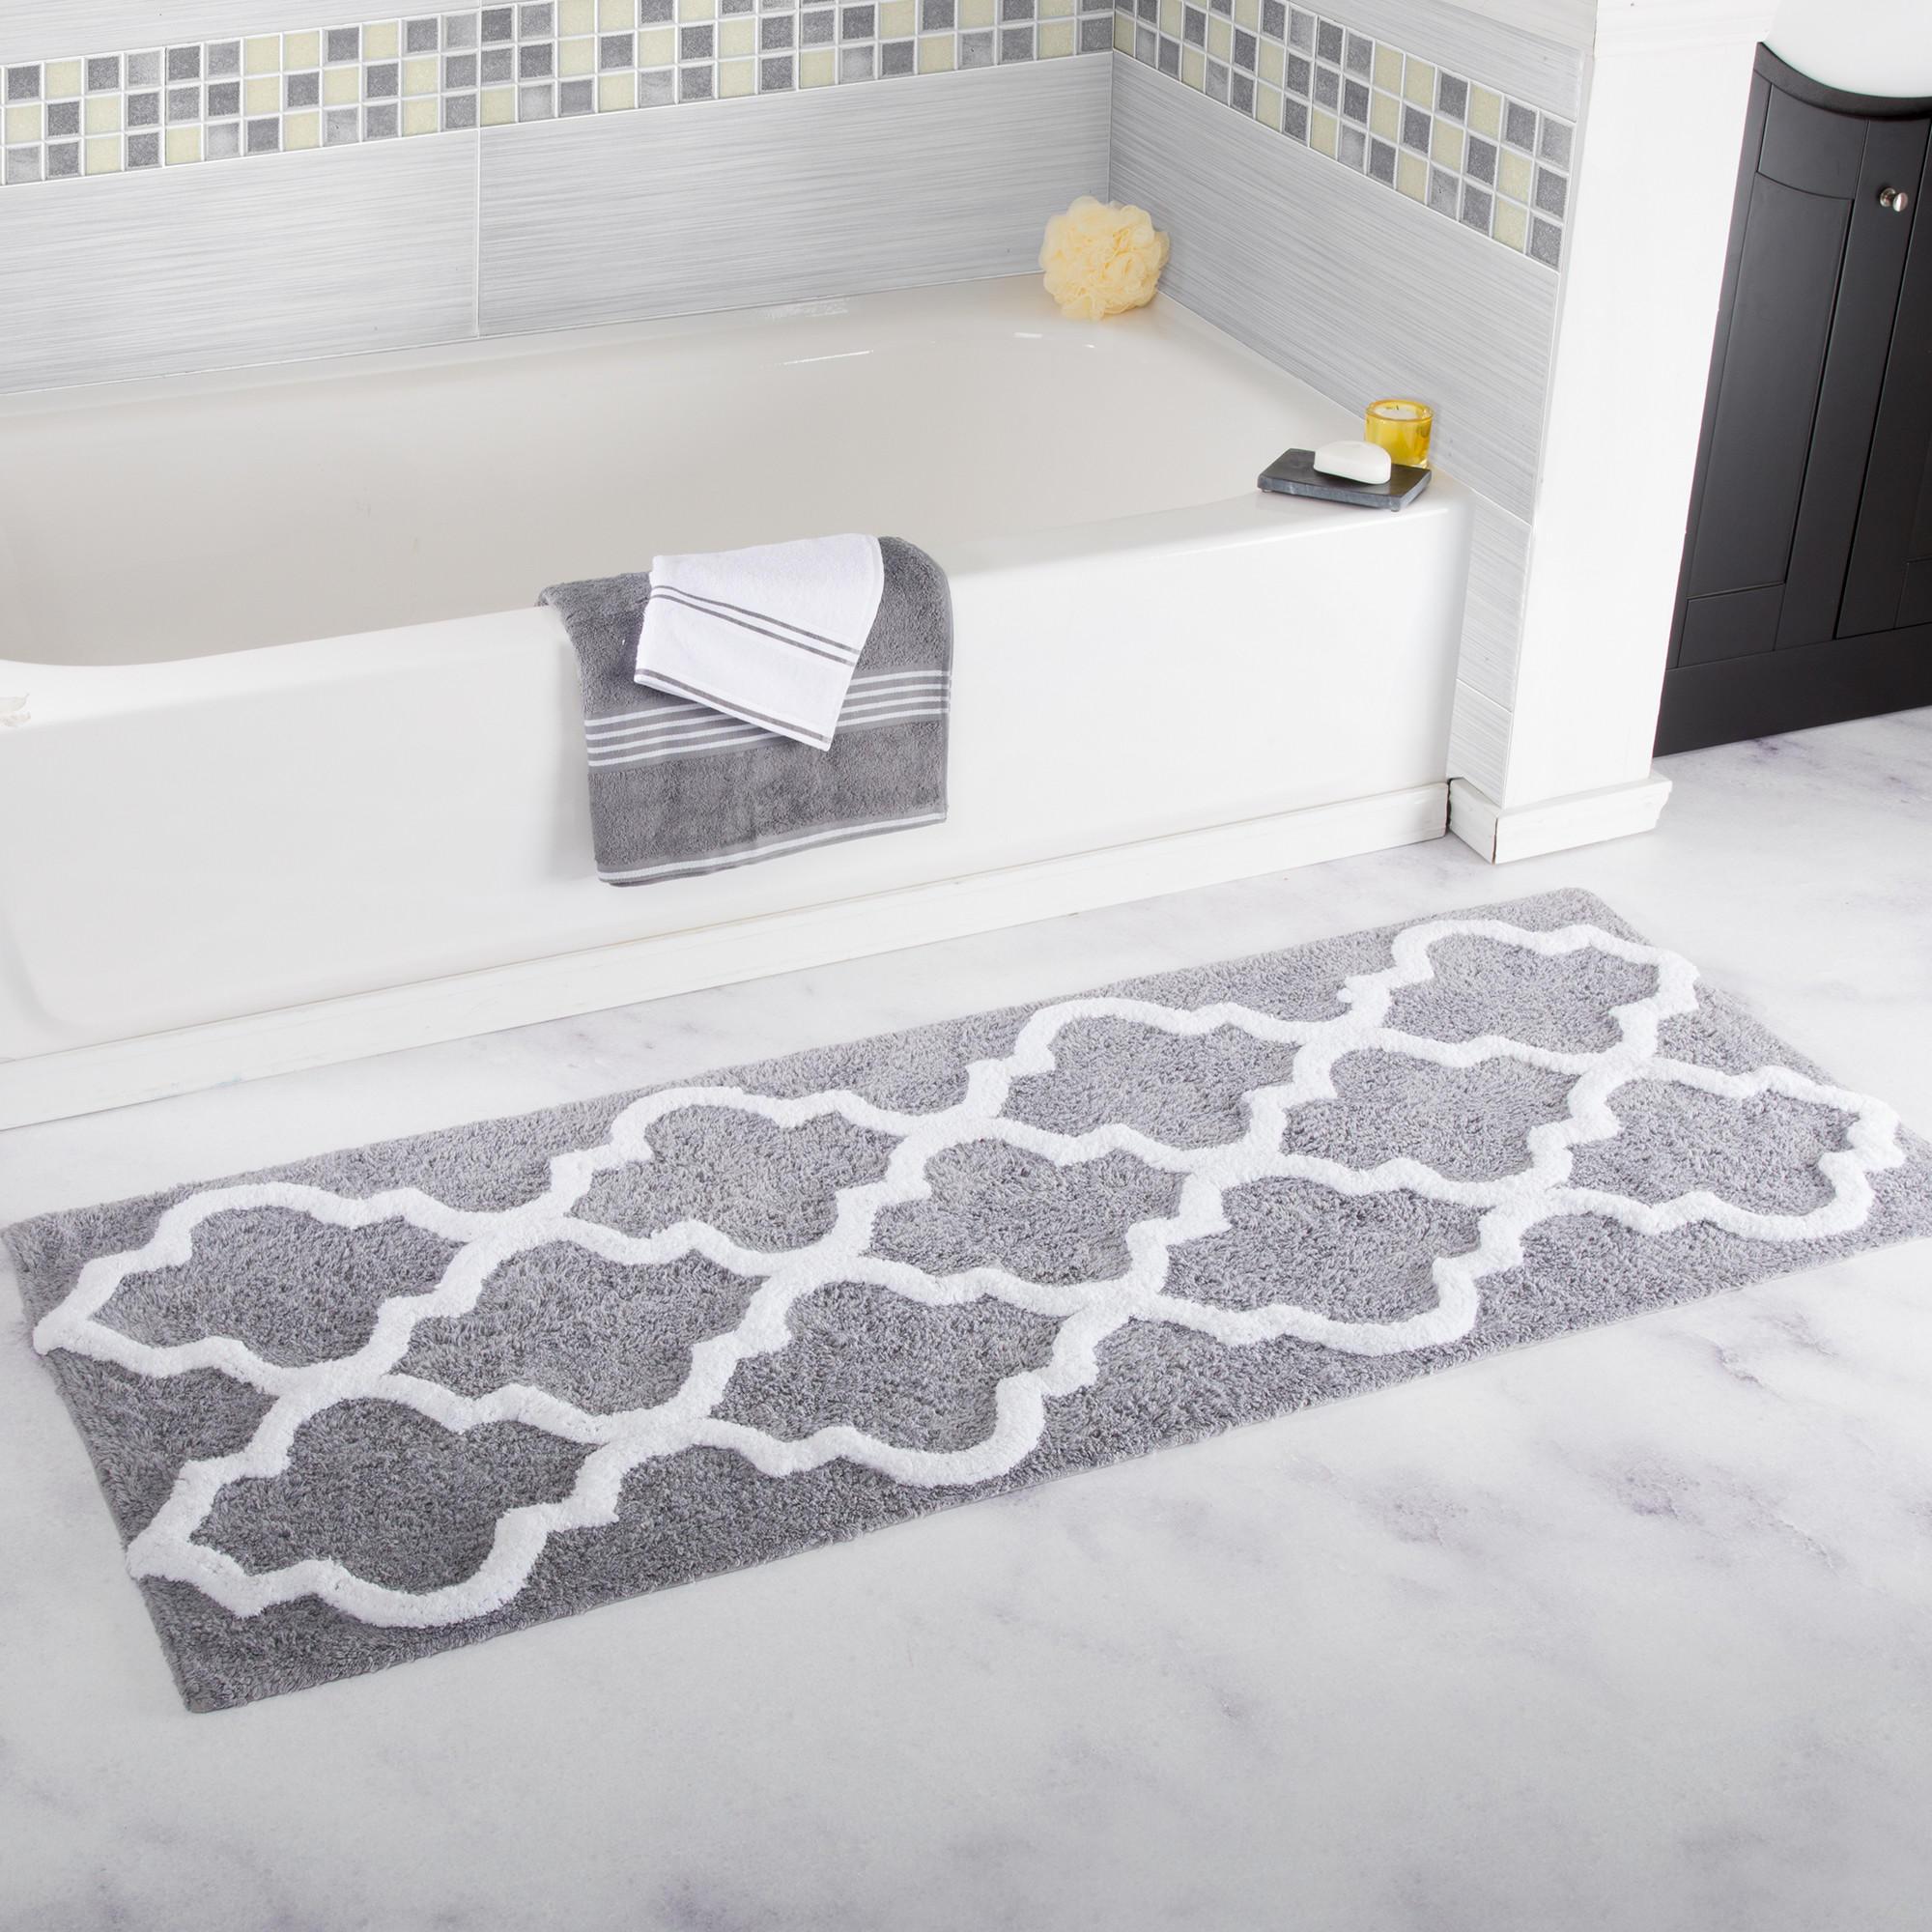 Area Rug Bedroom Bathroom Kitchen Non Slip Water Absorption